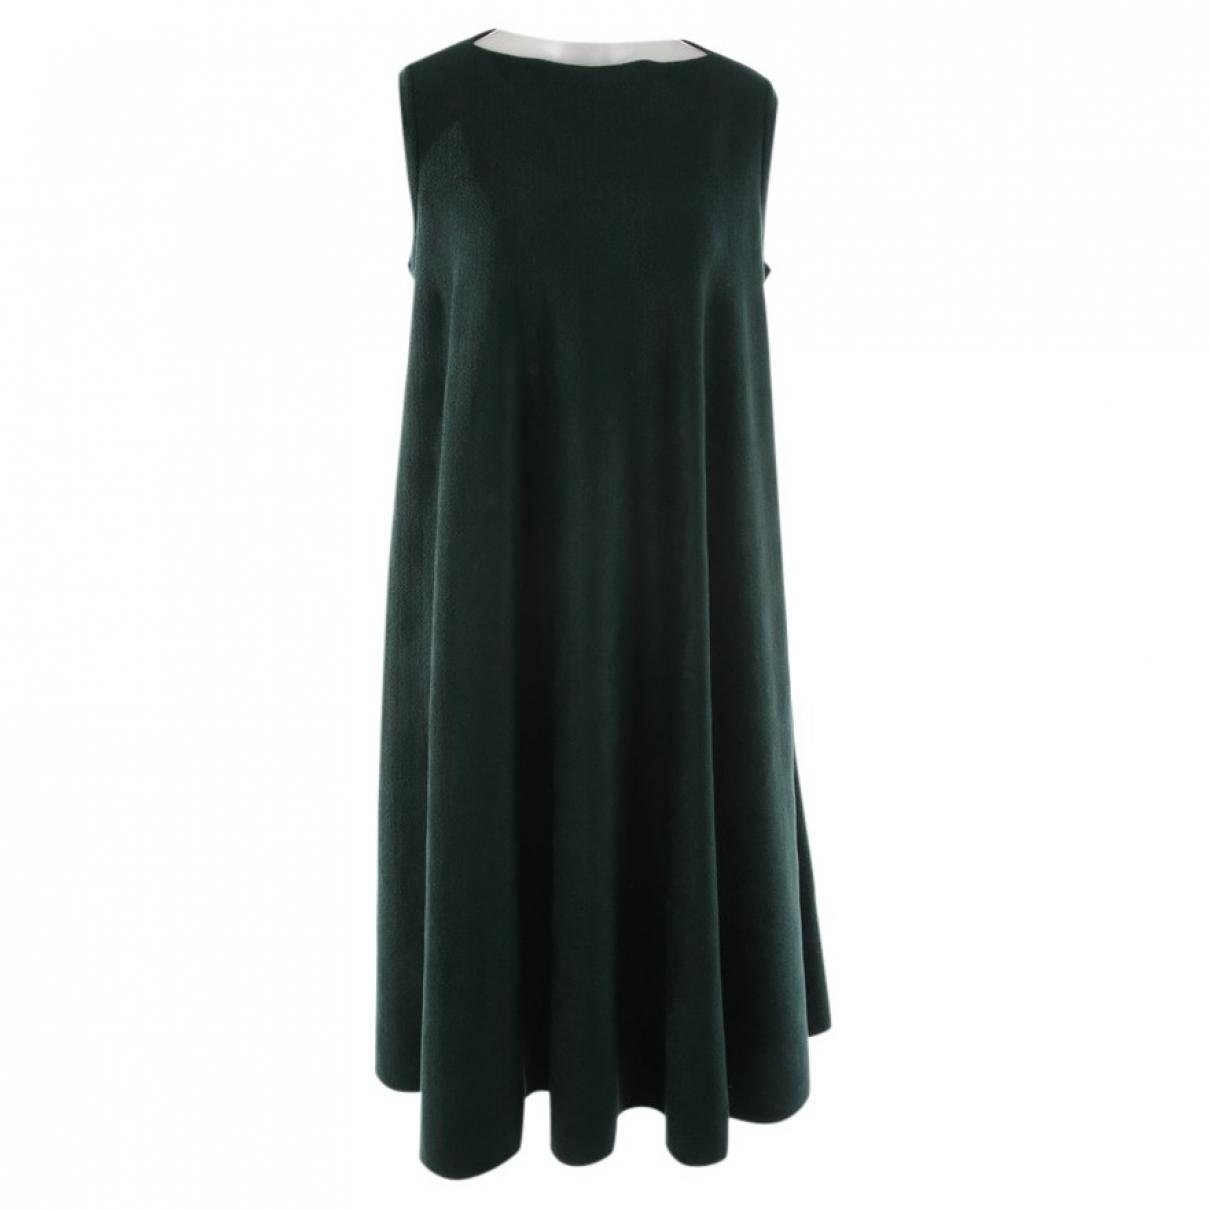 Alaia \N Kleid in  Gruen Wolle